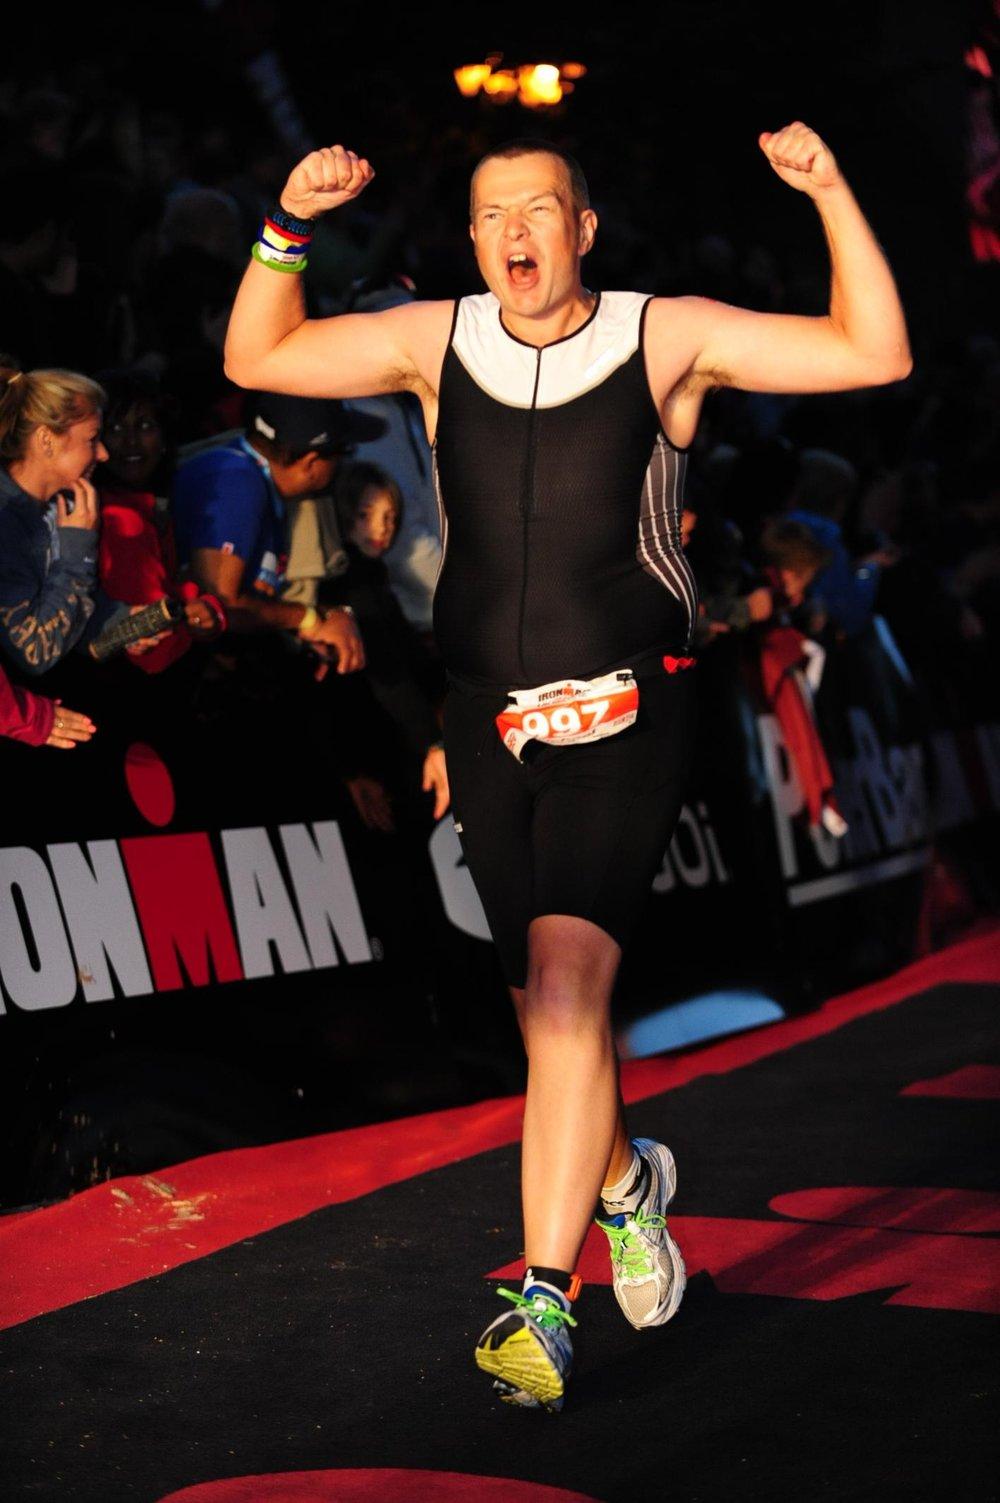 Michael Seddon  Ironman UK 2015 - 15:35:51